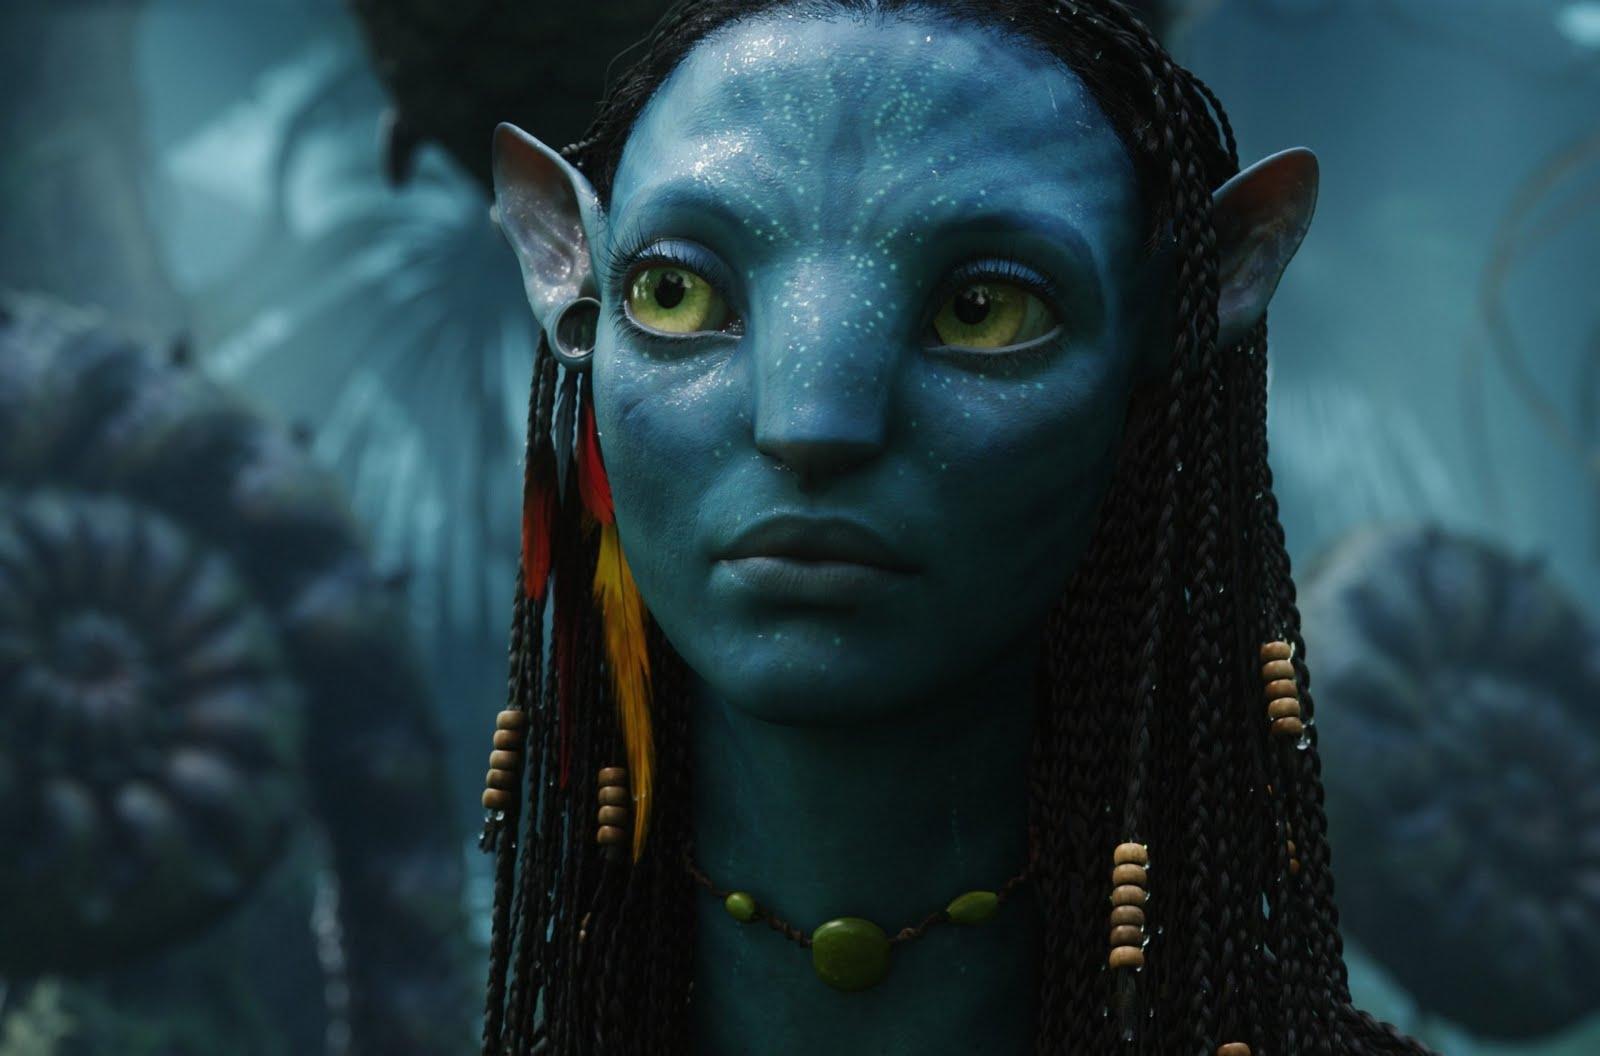 http://4.bp.blogspot.com/-F9byax29gkk/Te-9eyHfh_I/AAAAAAAAACE/wqaItNnJdjU/s1600/Neytiri+-+Zoe+Saldana+wallpaper+Avatar+Movie+-+Fond+d%2527ecran+film+Avatar+avec+Zoe+Saldana+alias+Neytiri.jpg